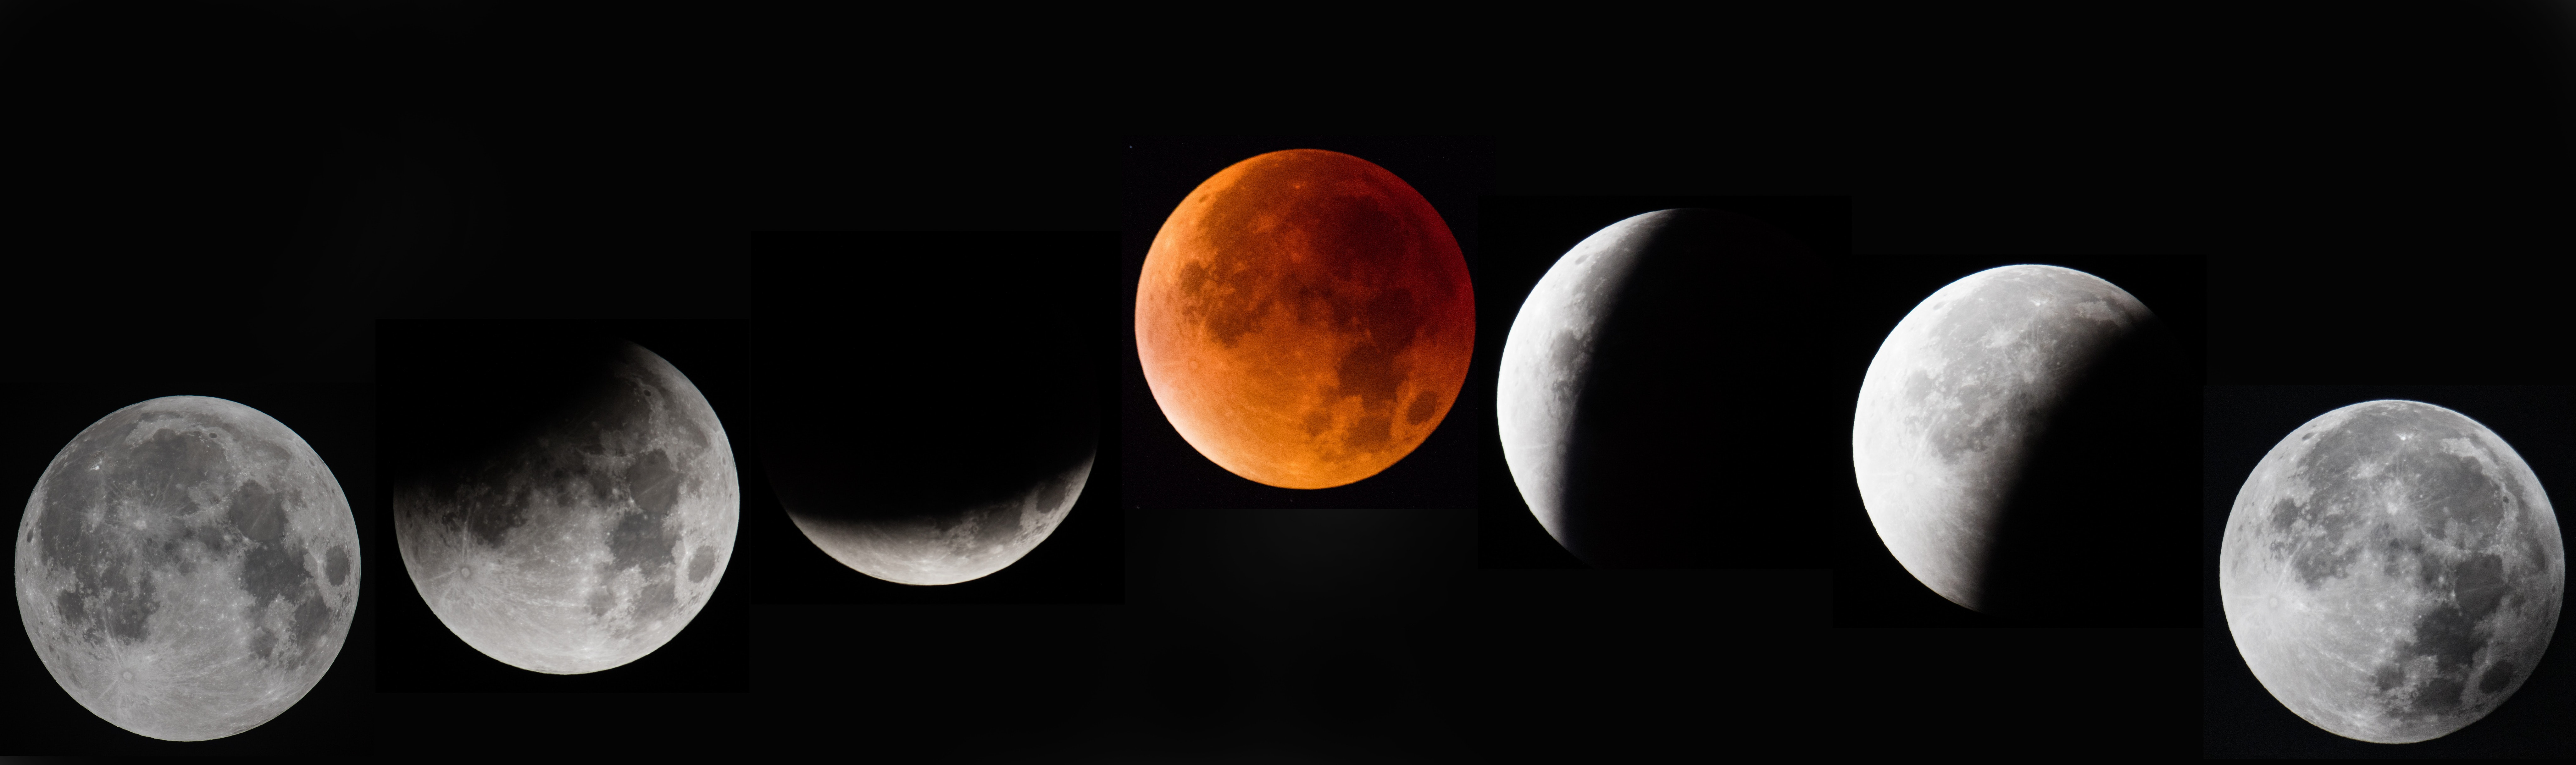 february 7 2020 blood moon astrology